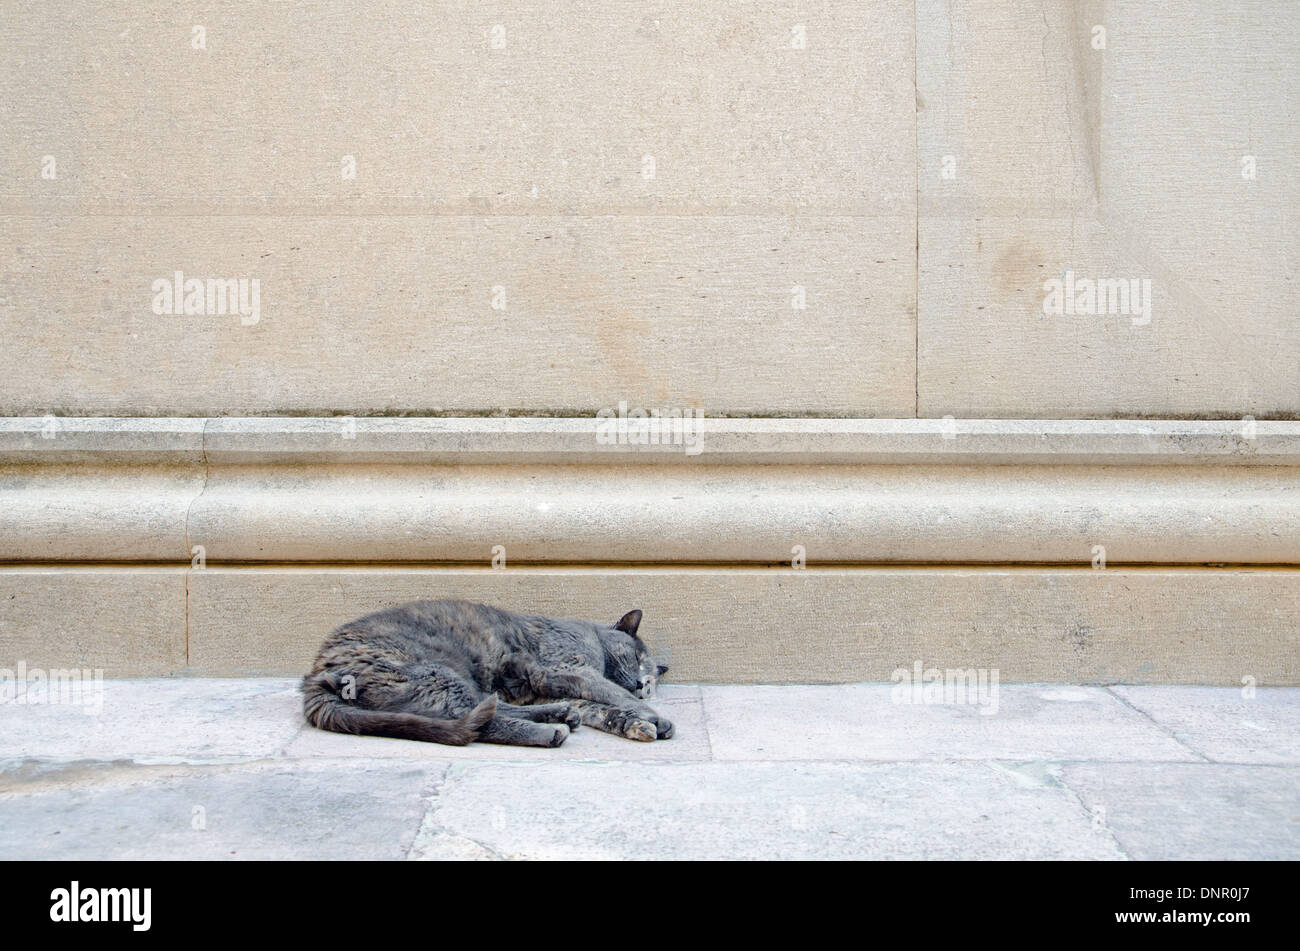 a sleeping street cat - Stock Image